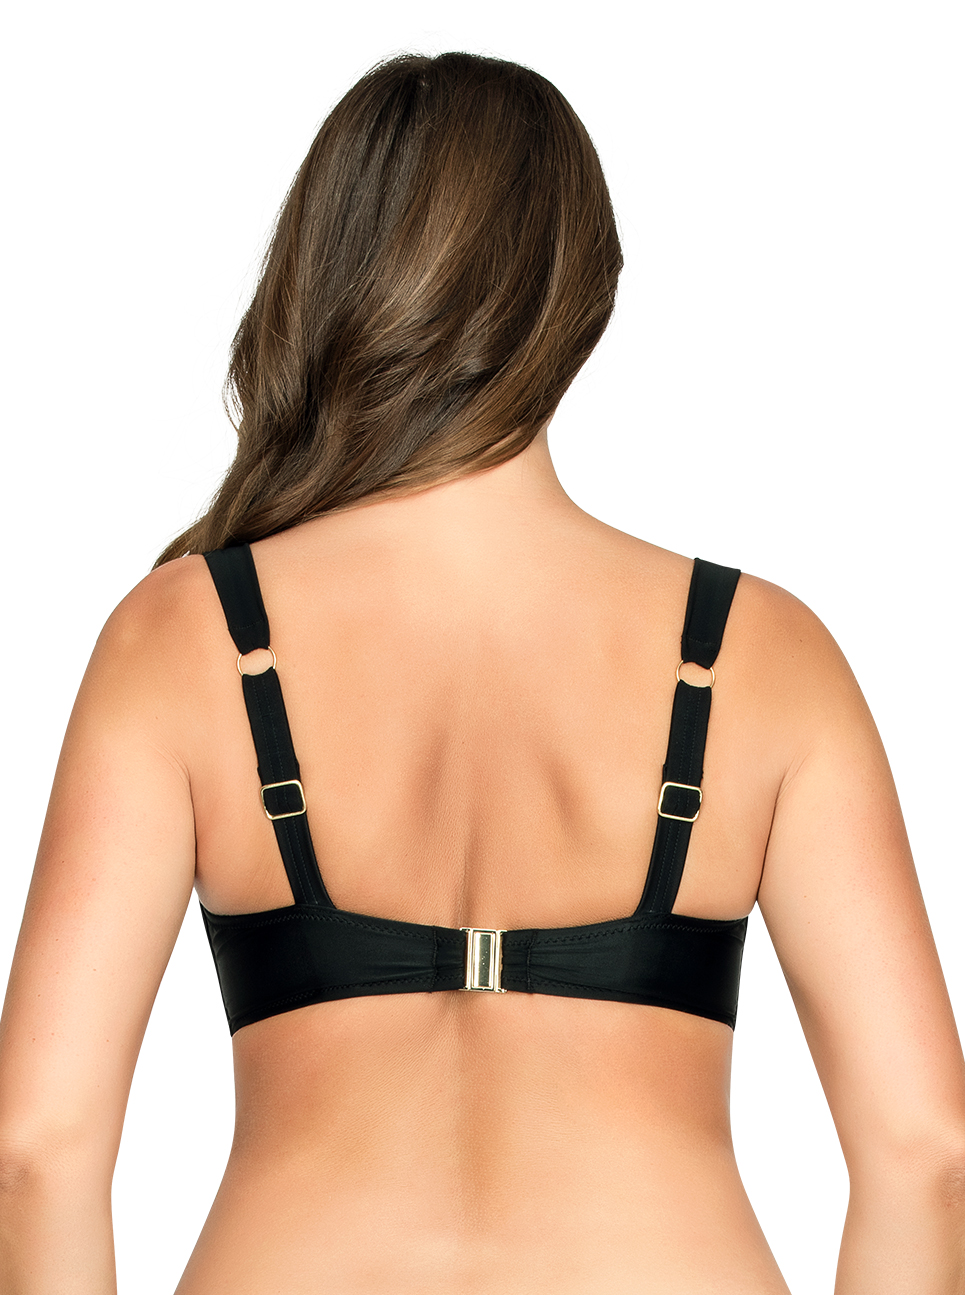 PARFAIT Oceane SoftPaddedBikiniTopS8061 Black Back - Oceane Soft-Padded Bikini Top Black S8061